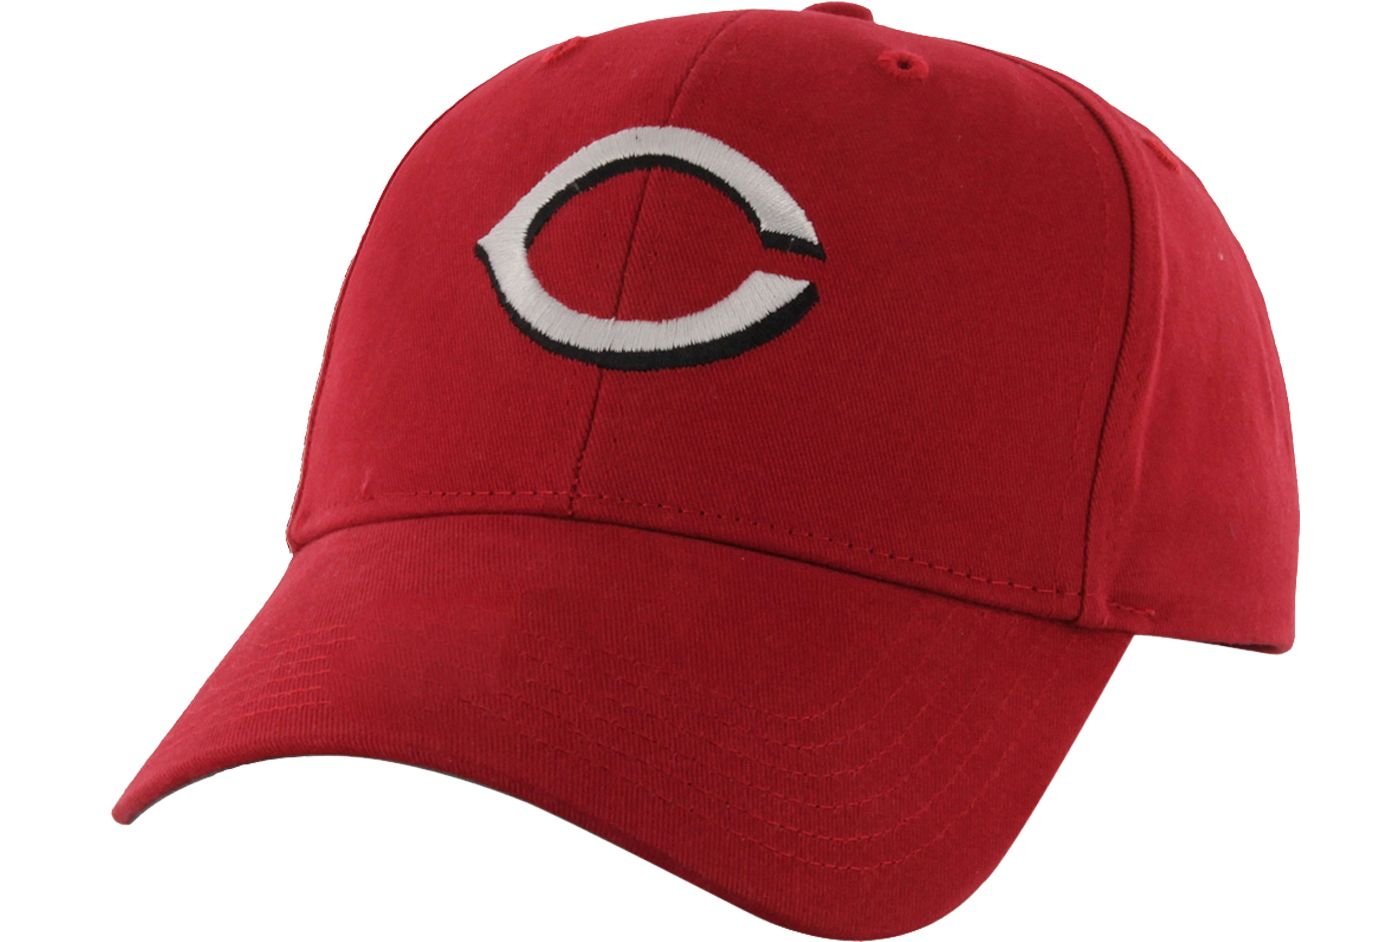 '47 Youth Cincinnati Reds Basic Red Adjustable Hat